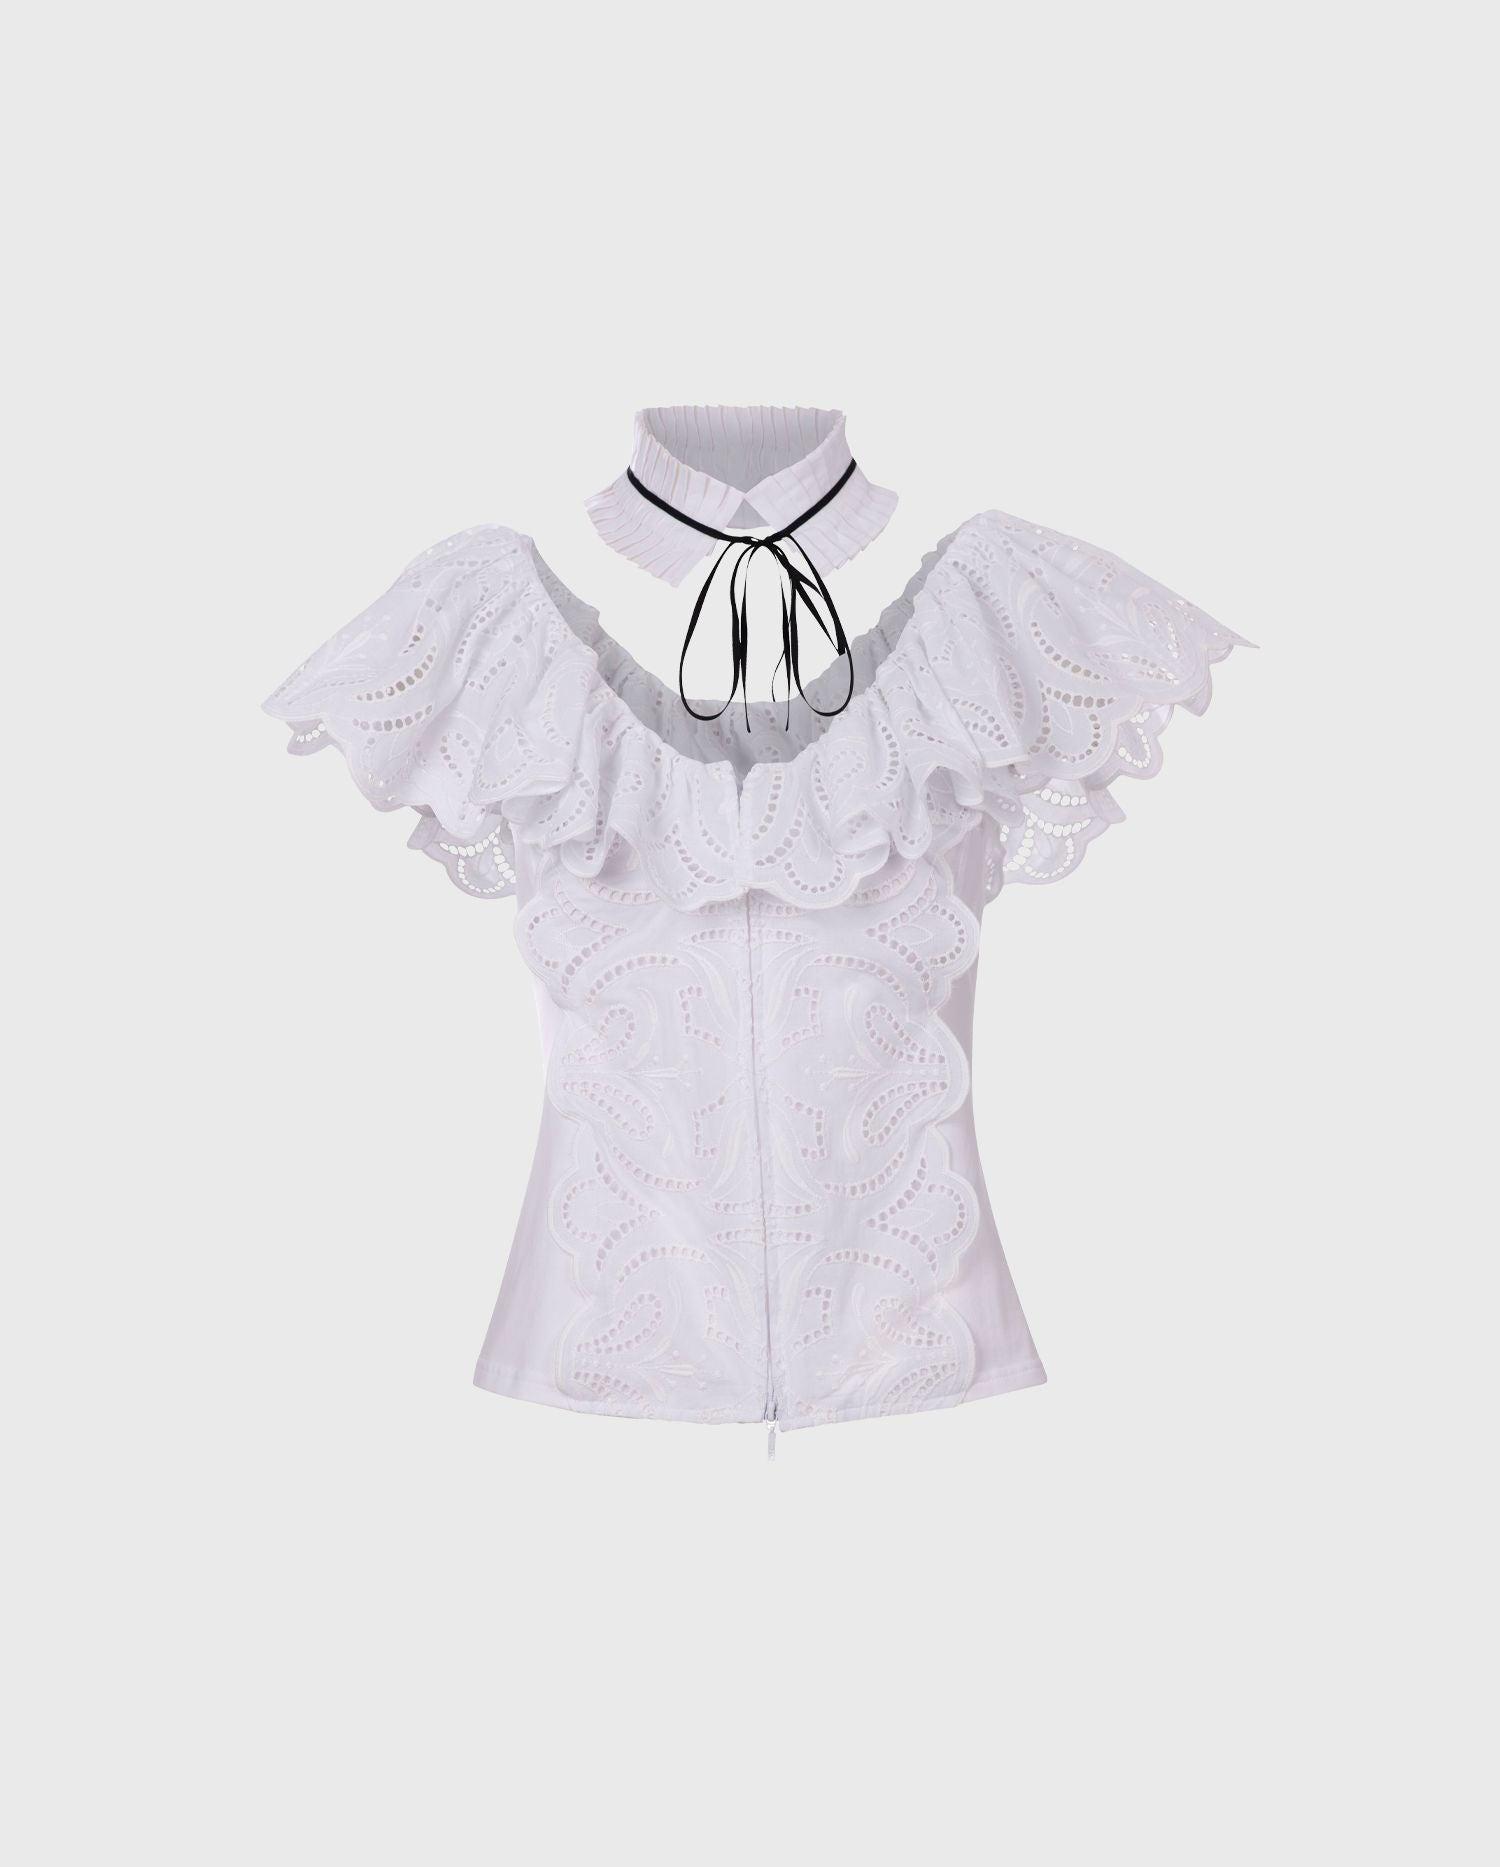 Anne Fontaine: CAYAN Shirt: Sleeveless shirt with eyelet ruffles